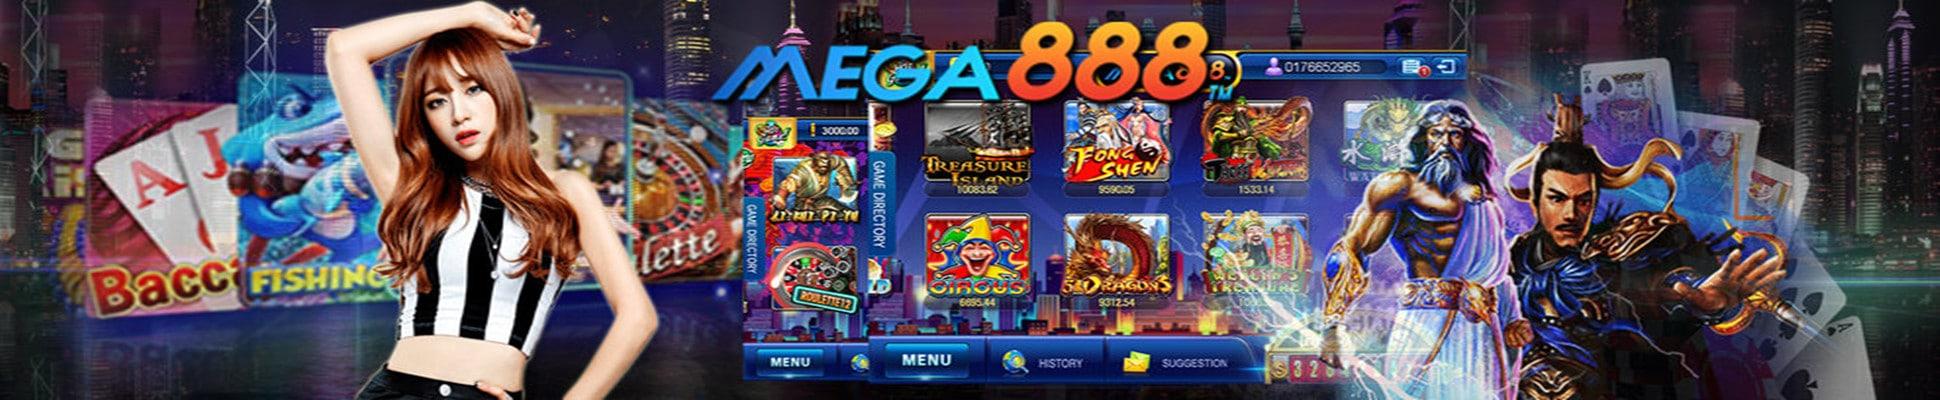 Mega888-BIGWIN369-ทดลองเล่น6